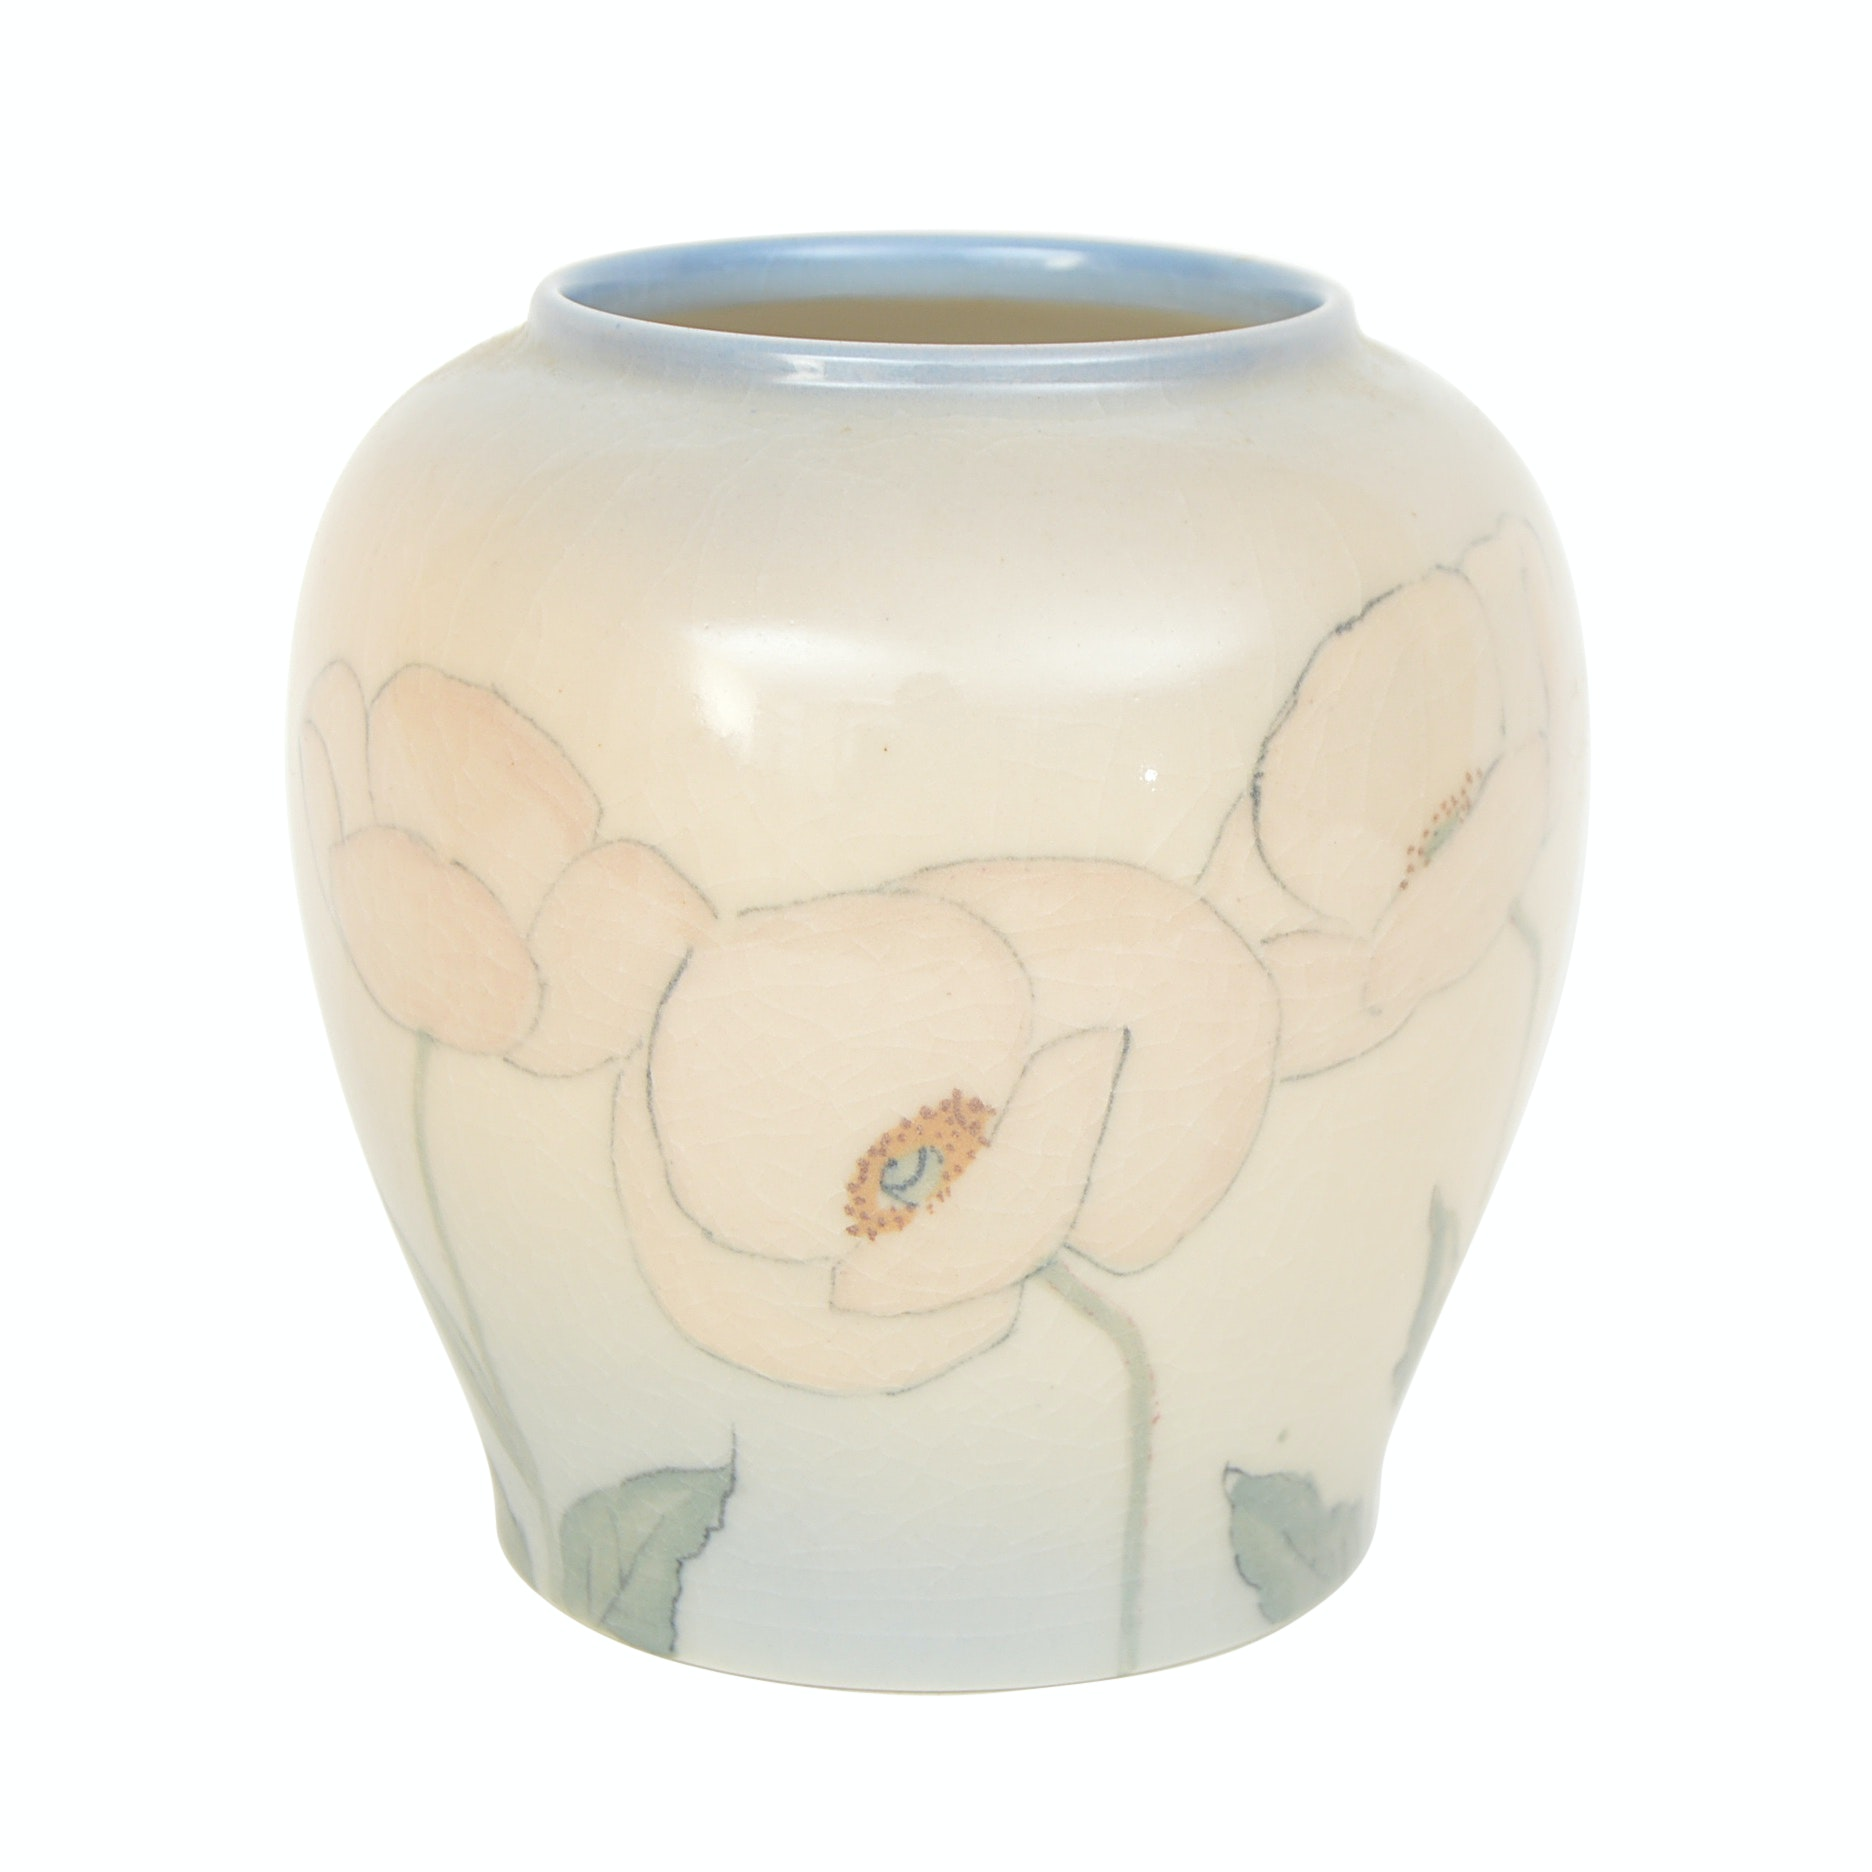 1945 Kataro Shirayamadani Rookwood Pottery Vase